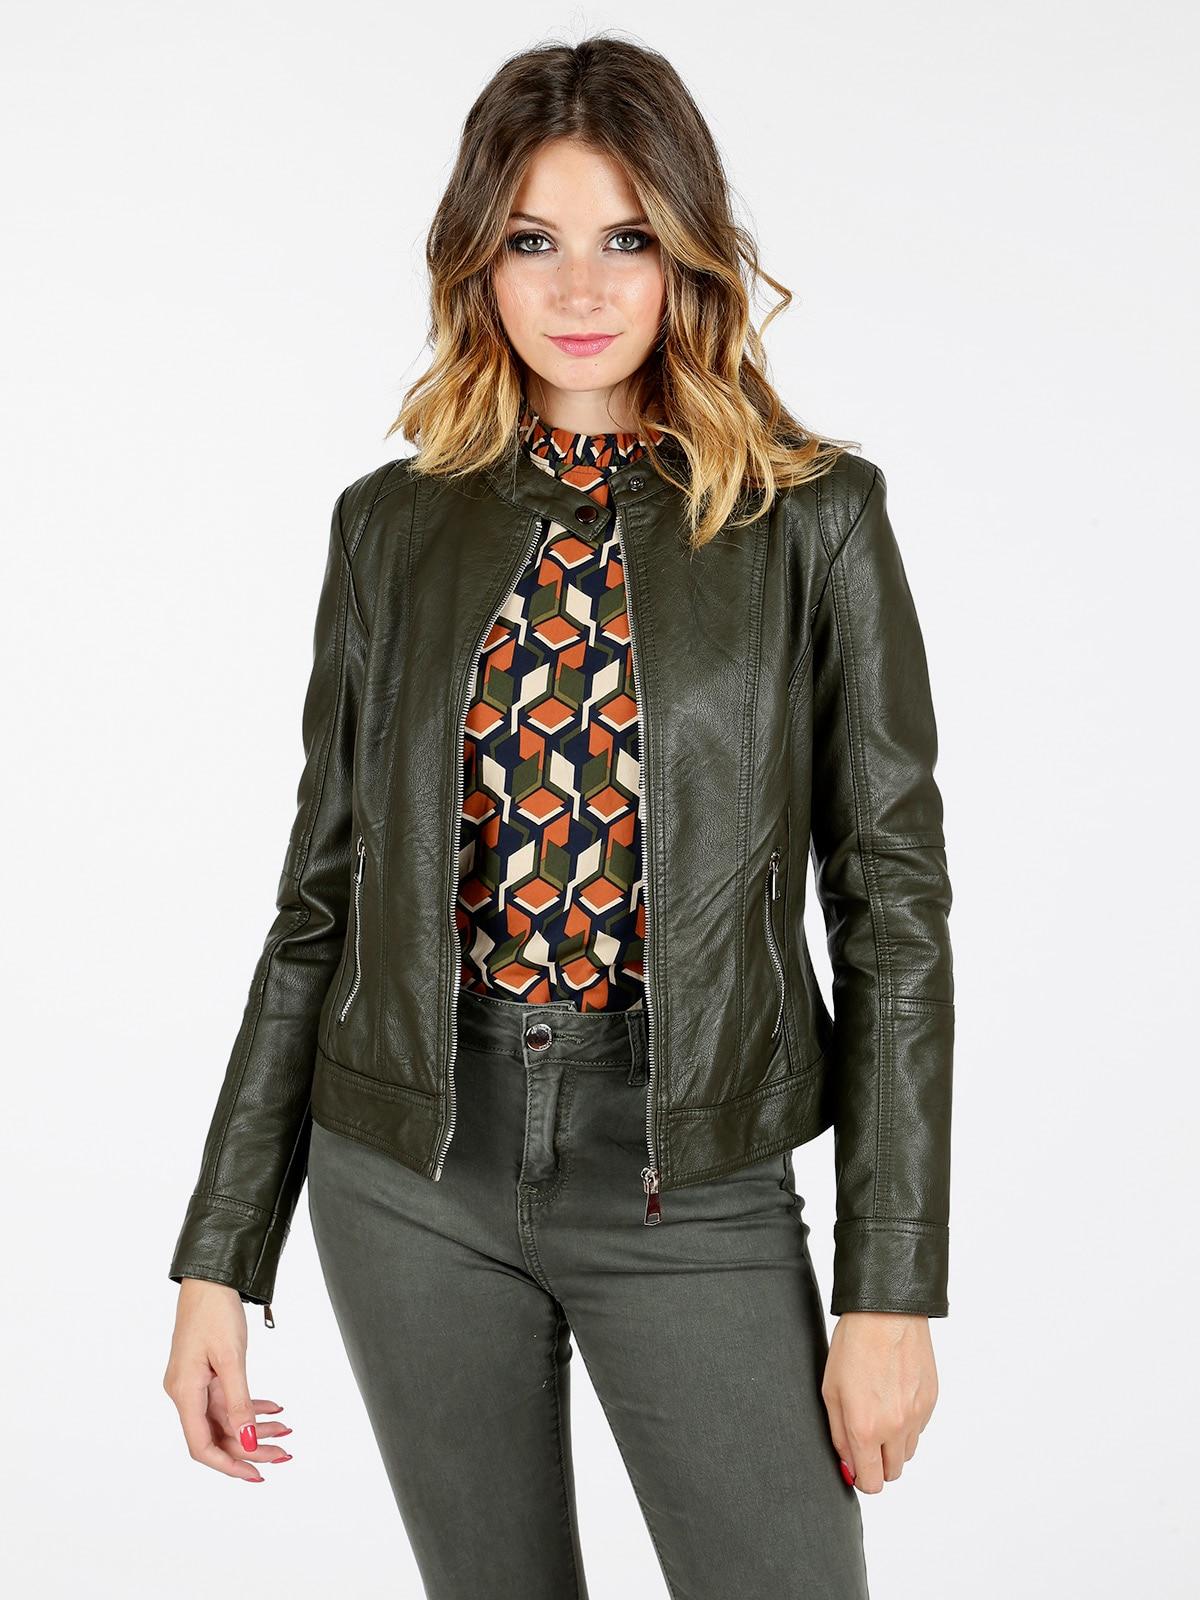 Motorsycle green faux   leather   jacket zipper coat woman